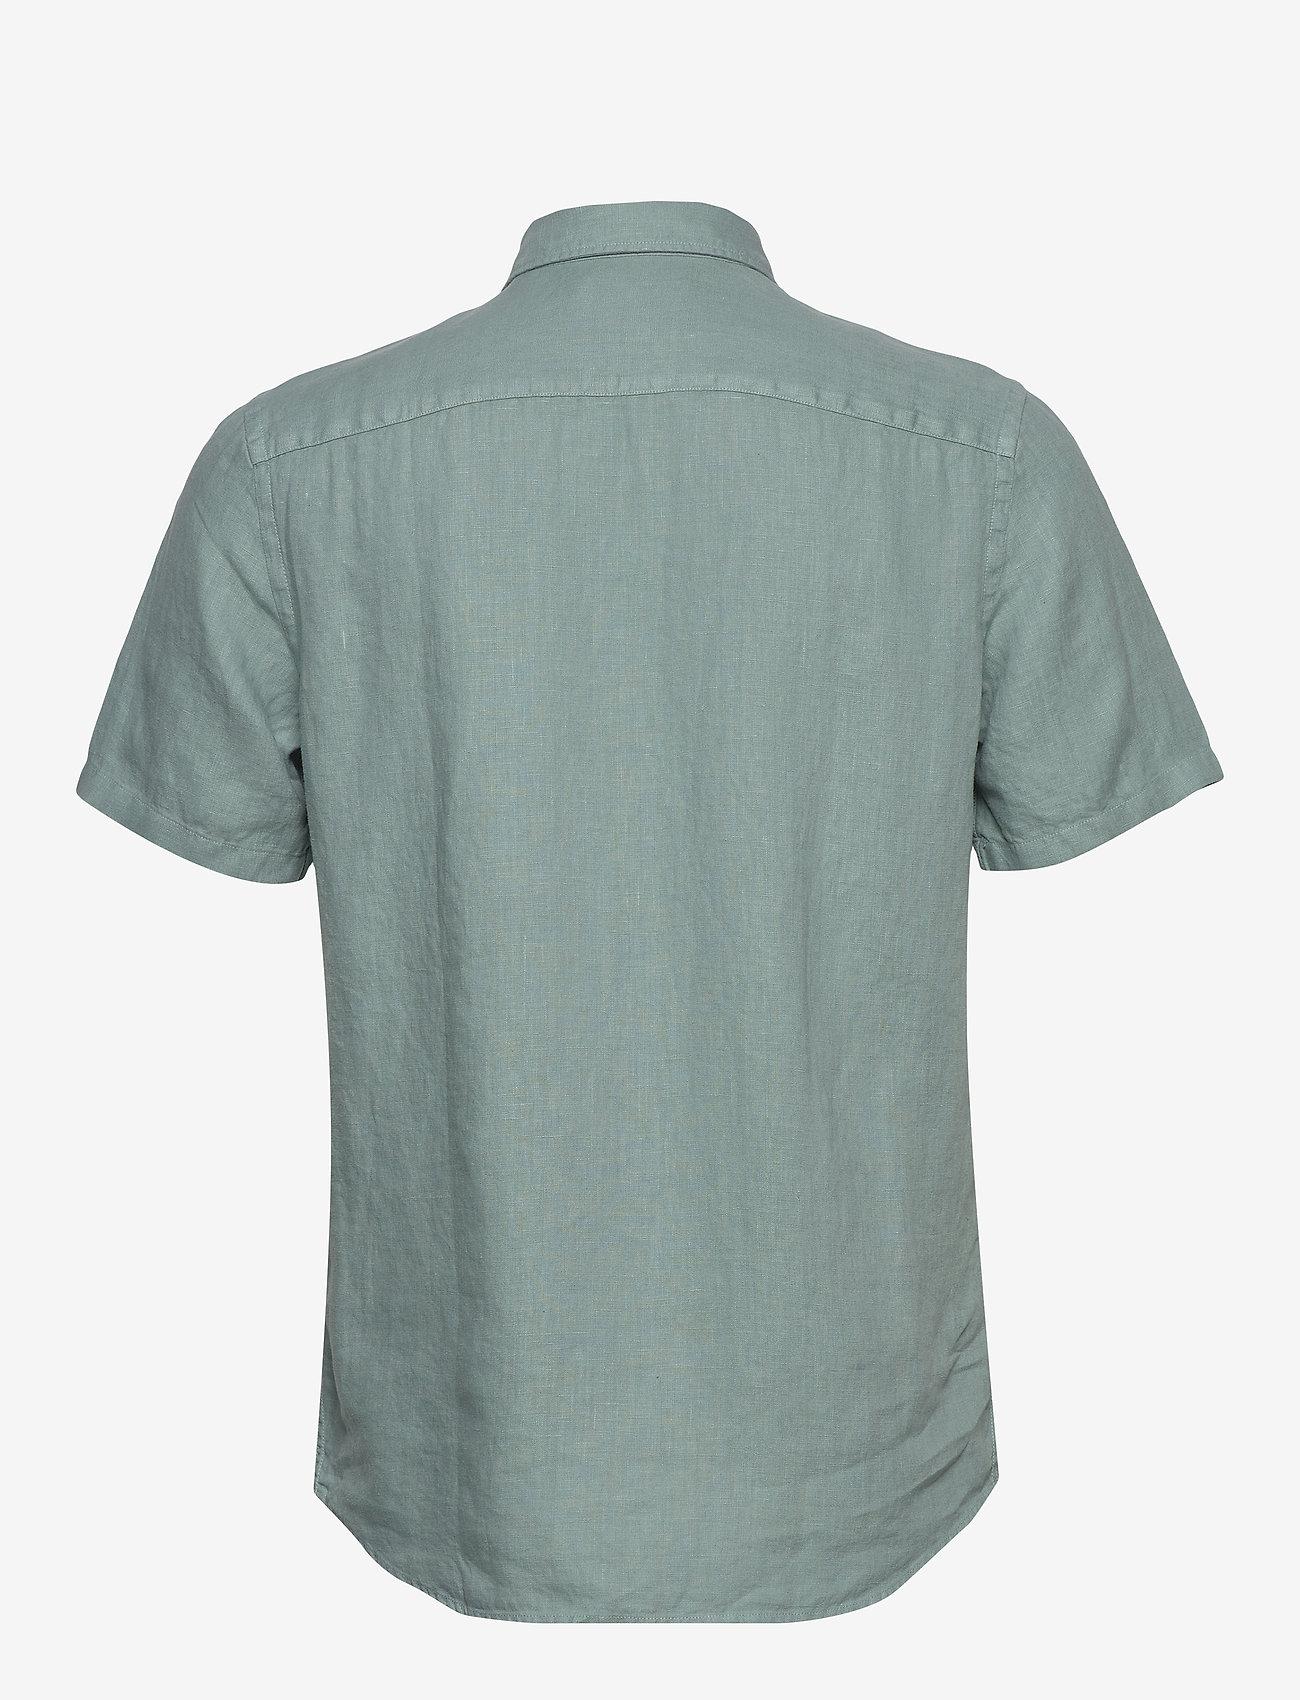 Scotch & Soda - REGULAR FIT- Shortsleeve garment -dyed linen shirt - basic skjorter - emerald - 1